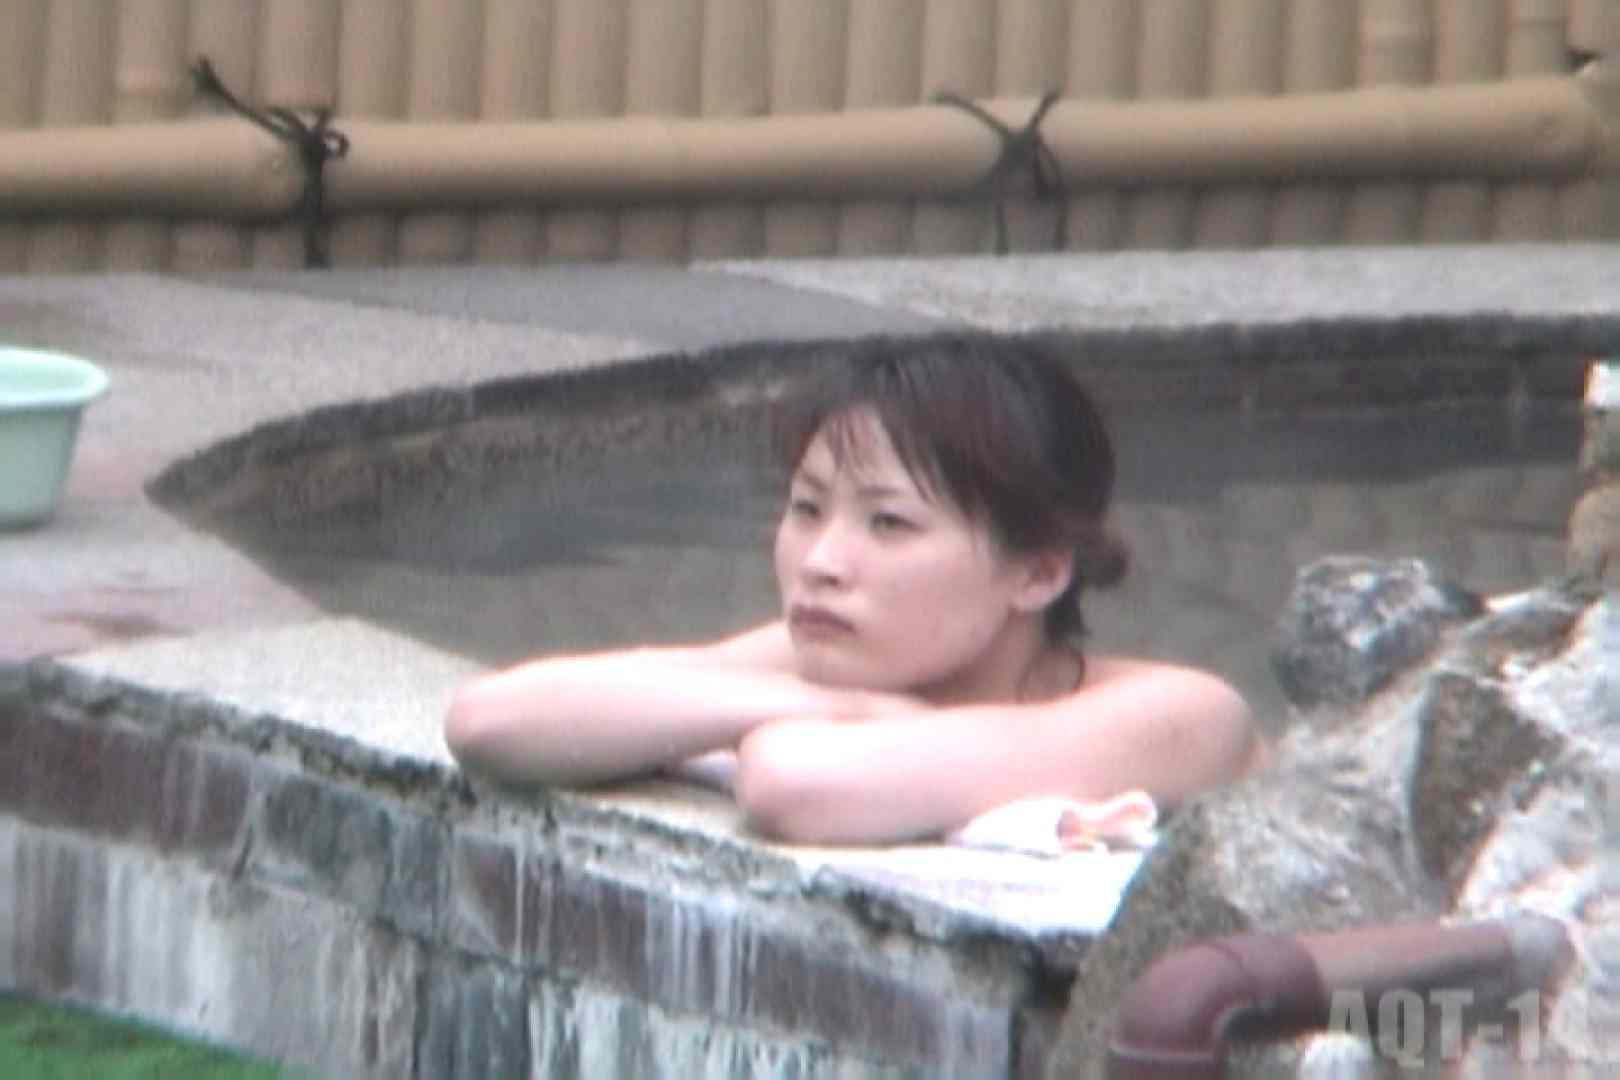 Aquaな露天風呂Vol.822 OLのエロ生活   露天風呂  62連発 1